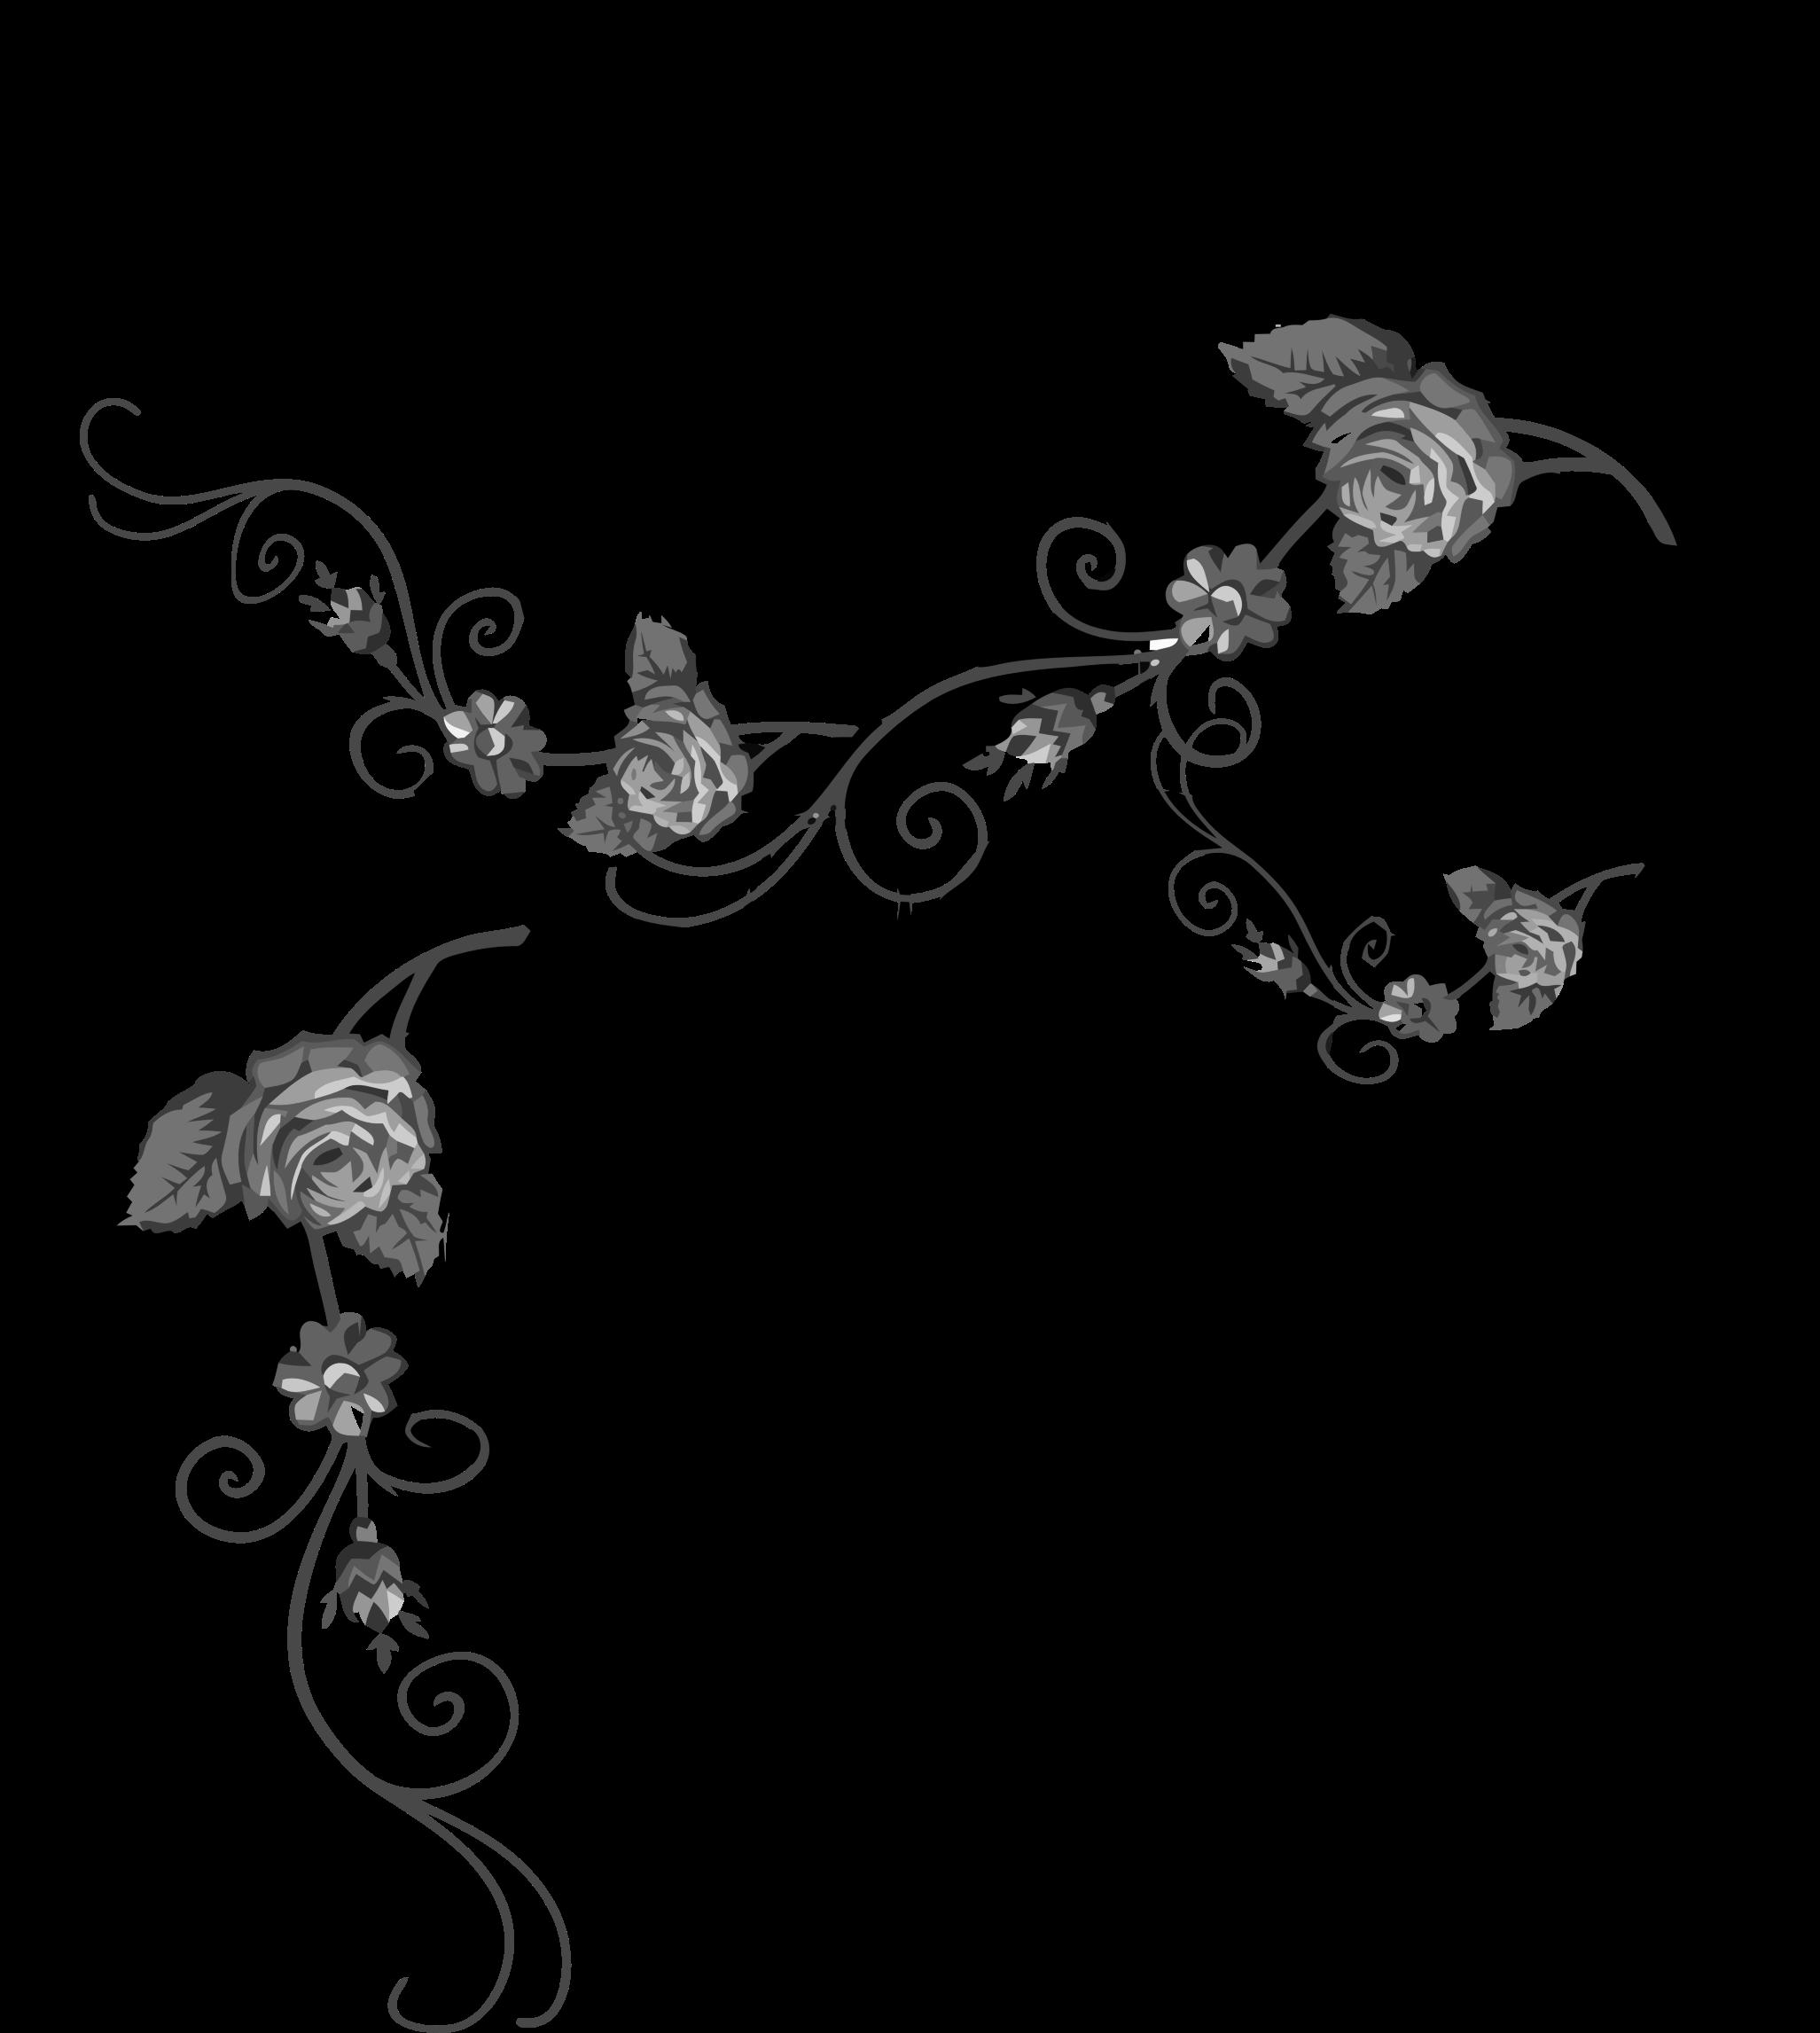 Flourish big image png. Floral clipart rose